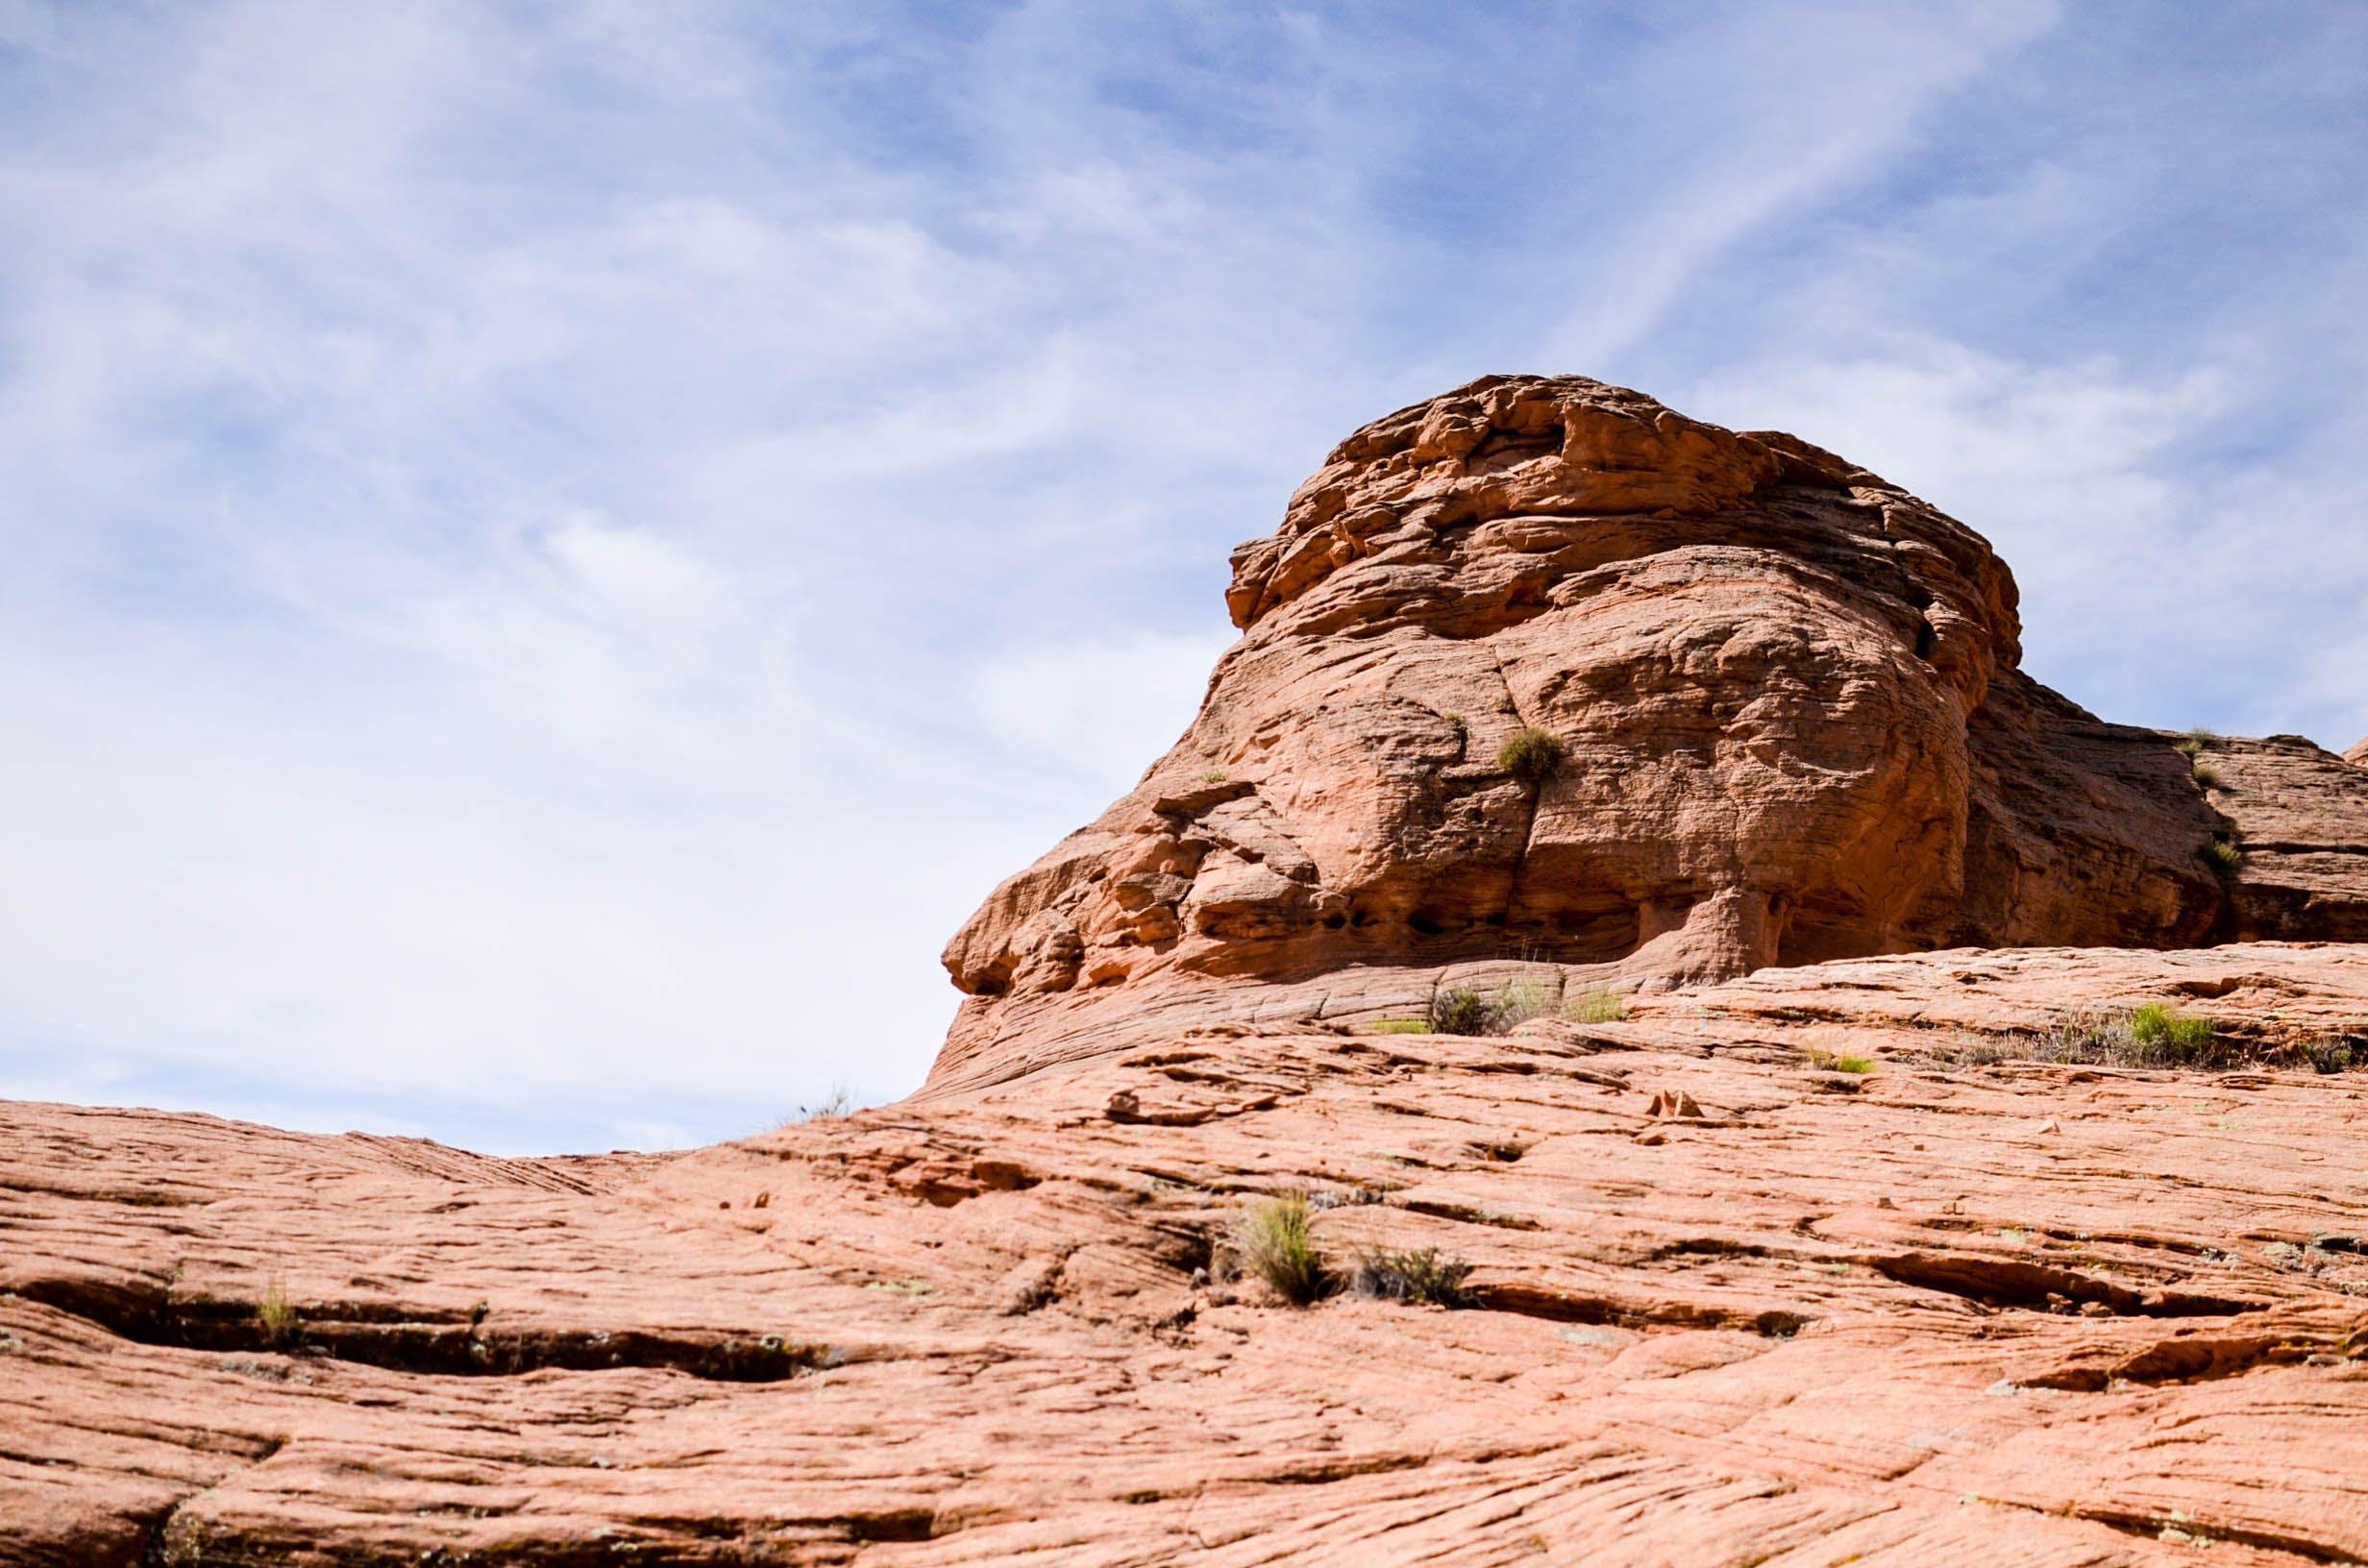 Kostenloses Stock Foto zu berg, canyon, dürr, erosion